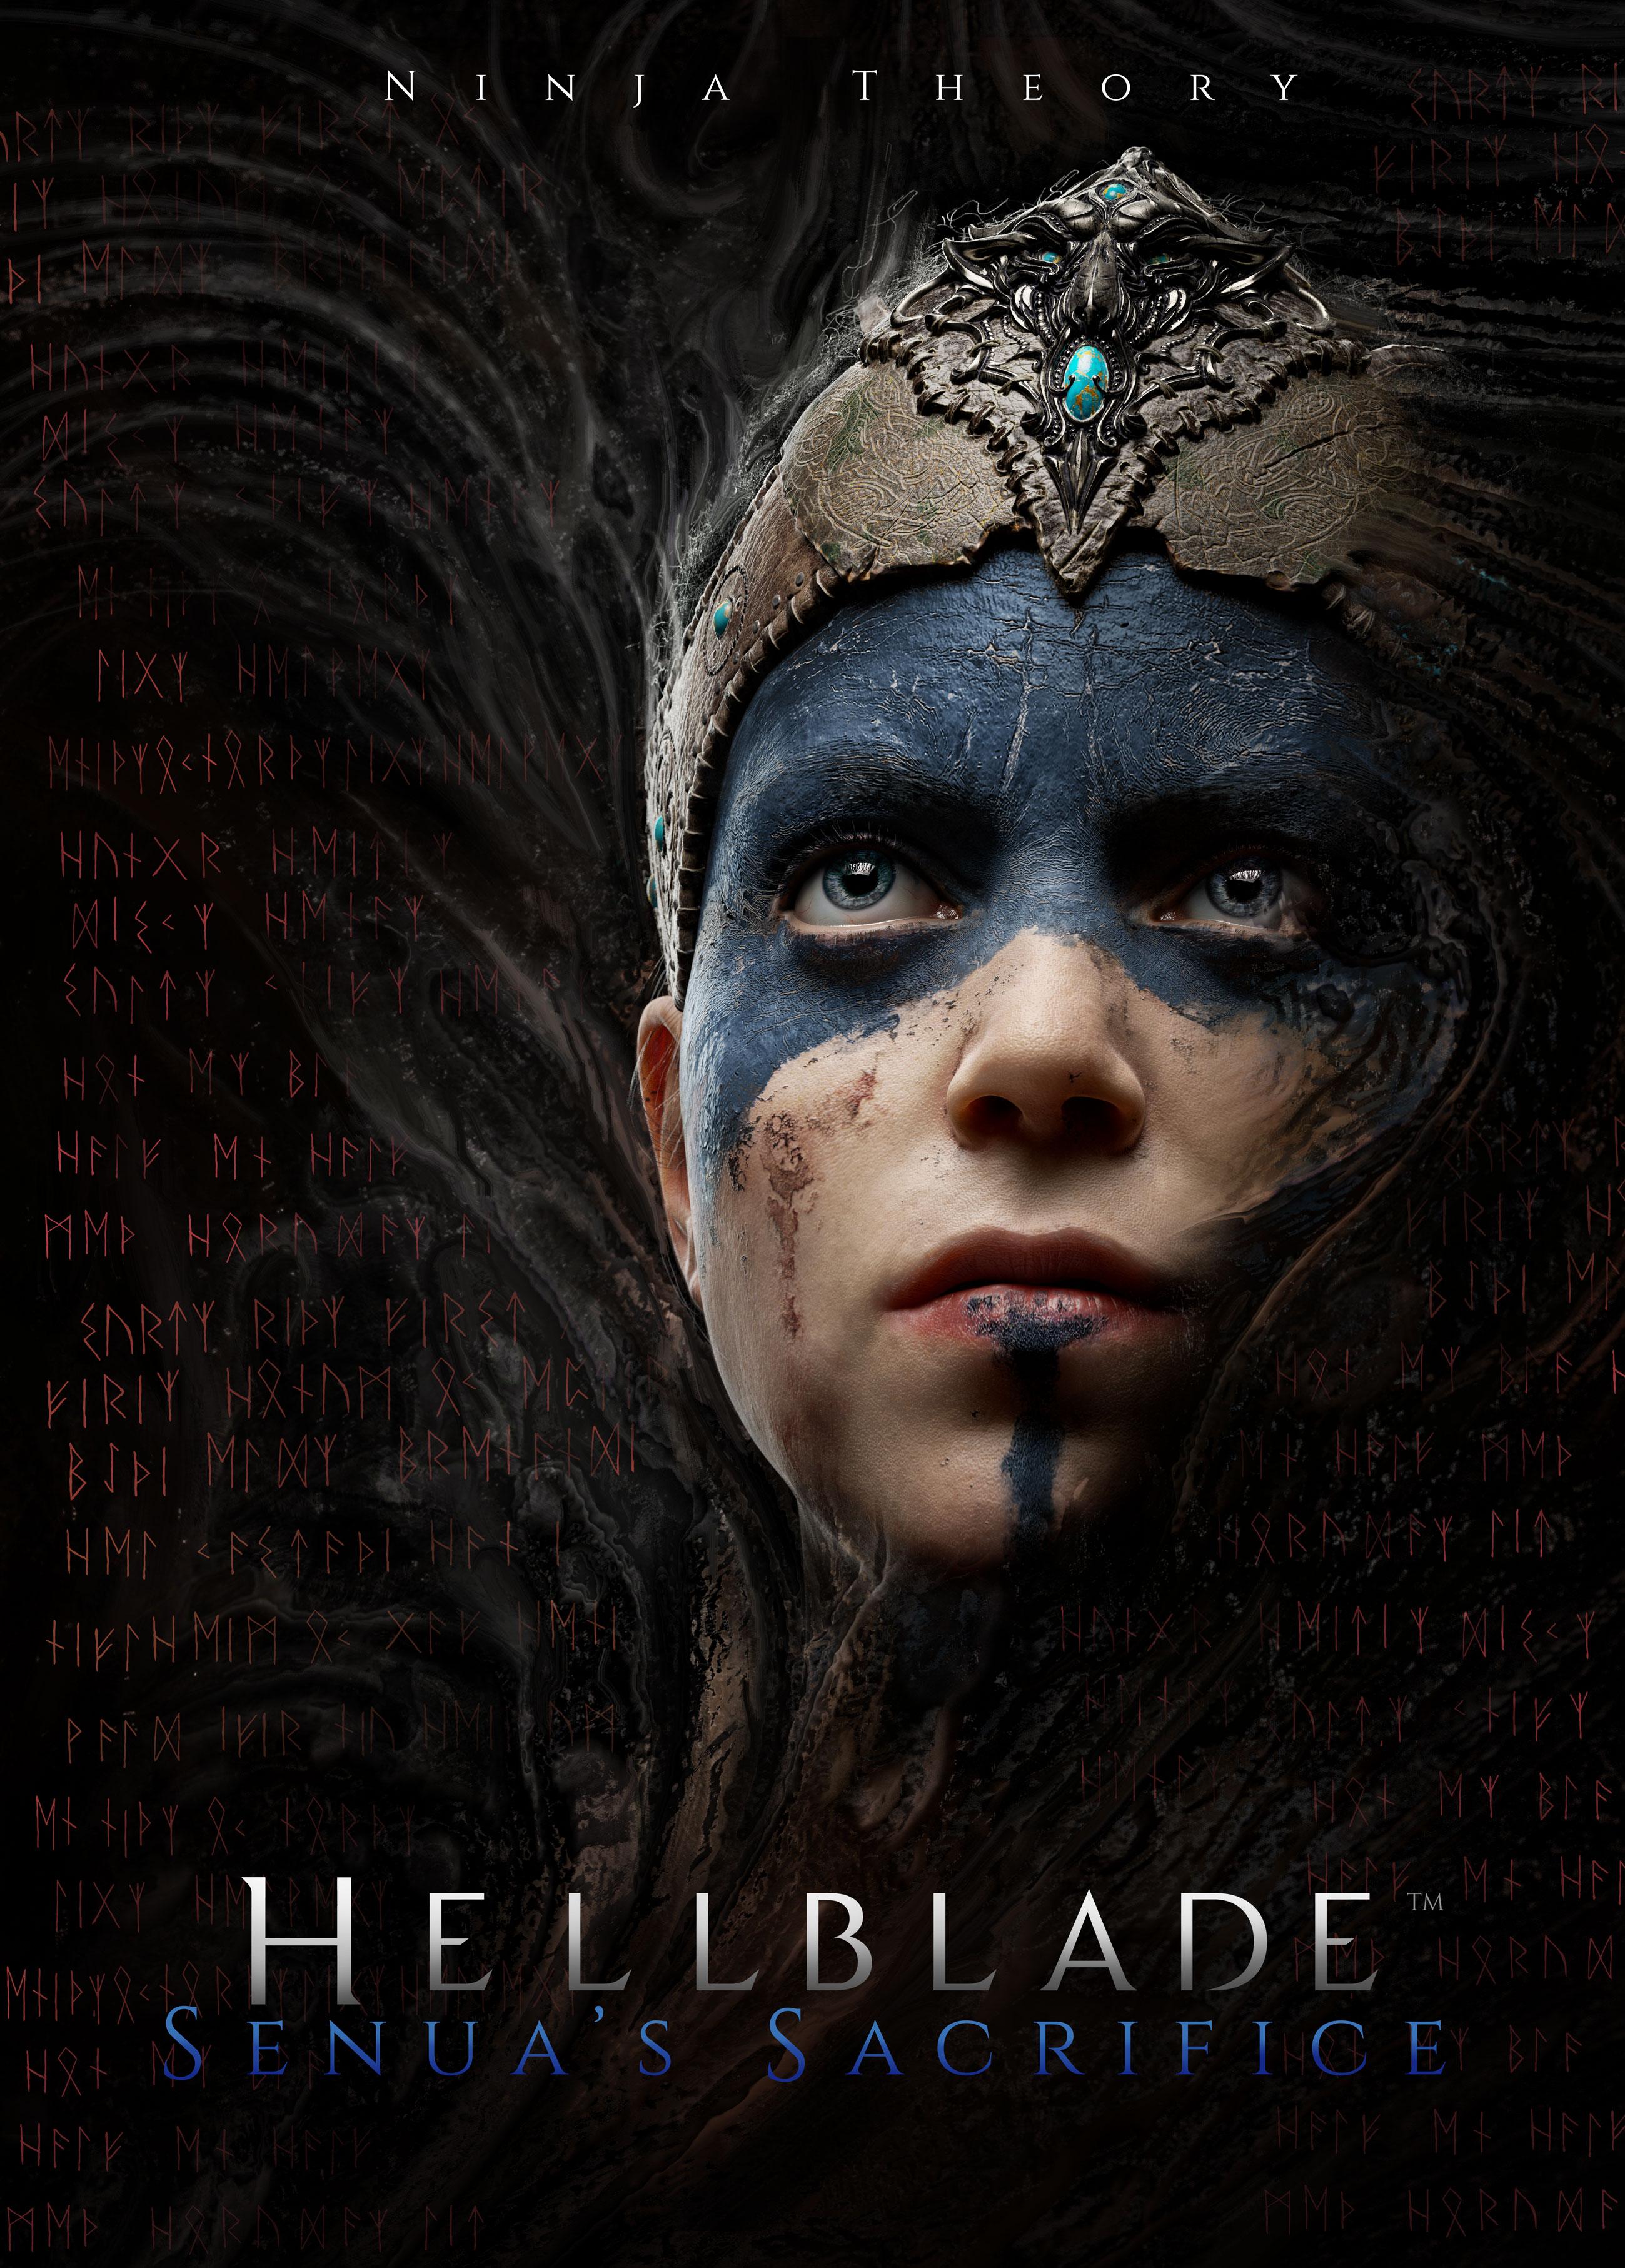 Hellblade poster